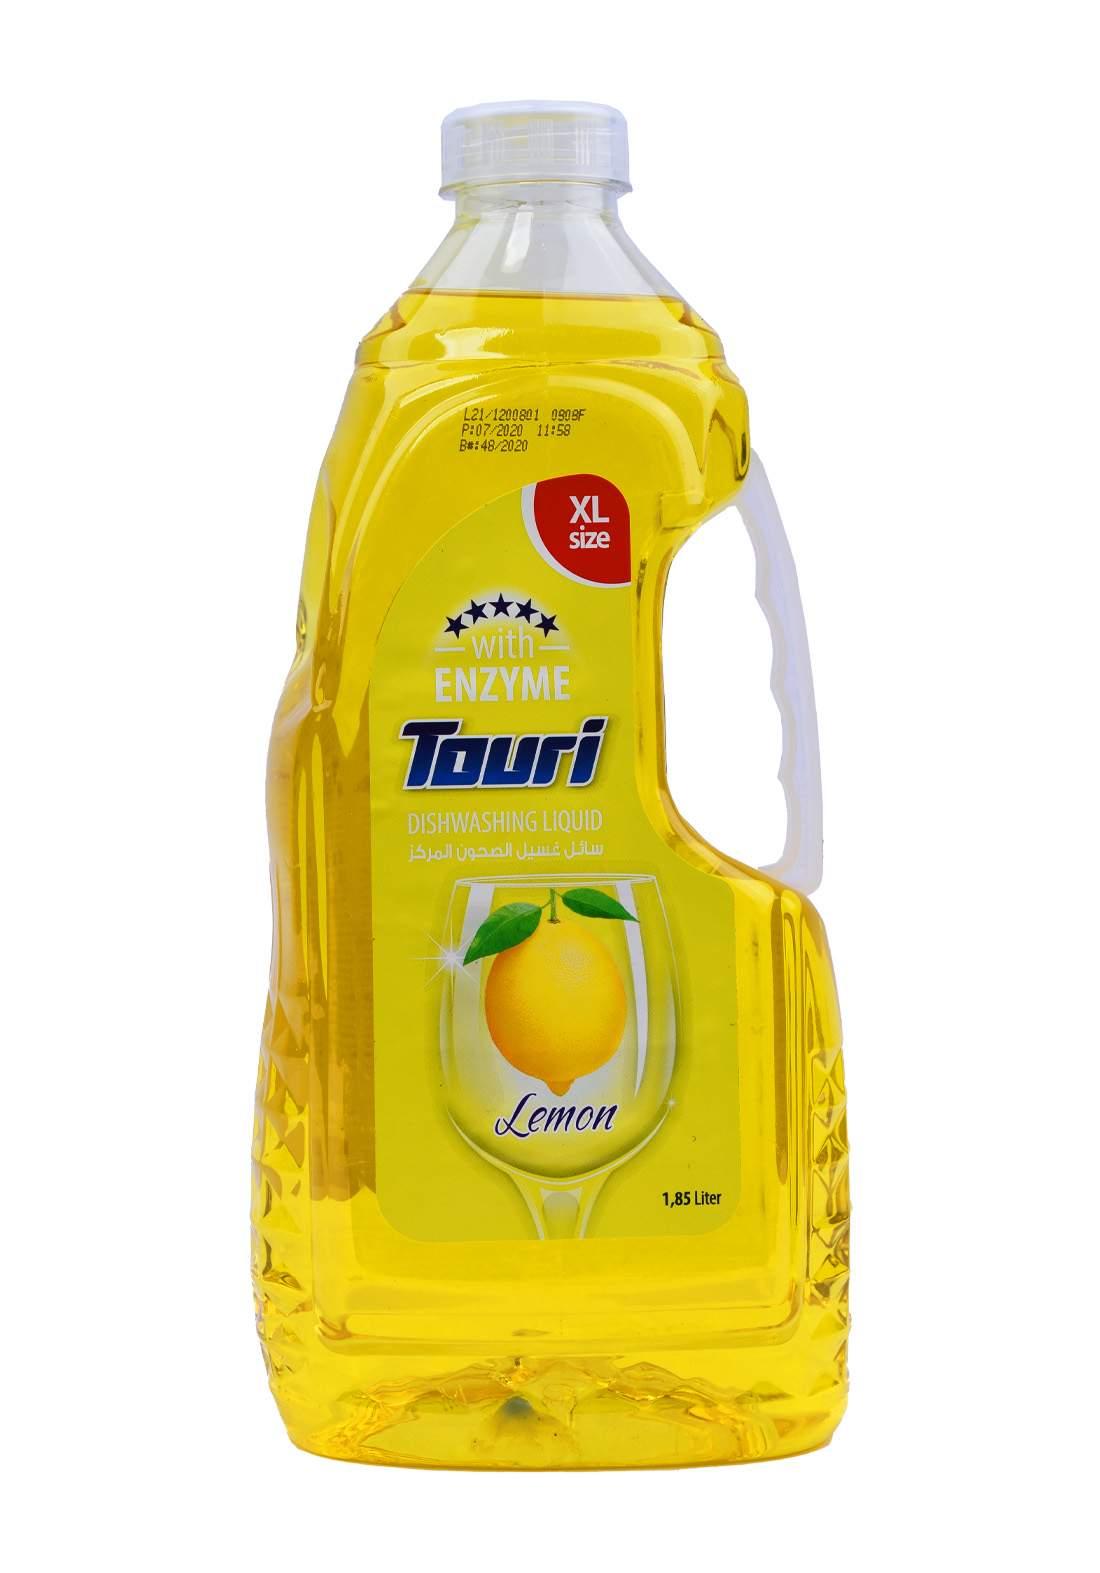 Touri Dishwashing Liquid Lemon 1800 ml سائل غسيل الصحون برائحة الليمون